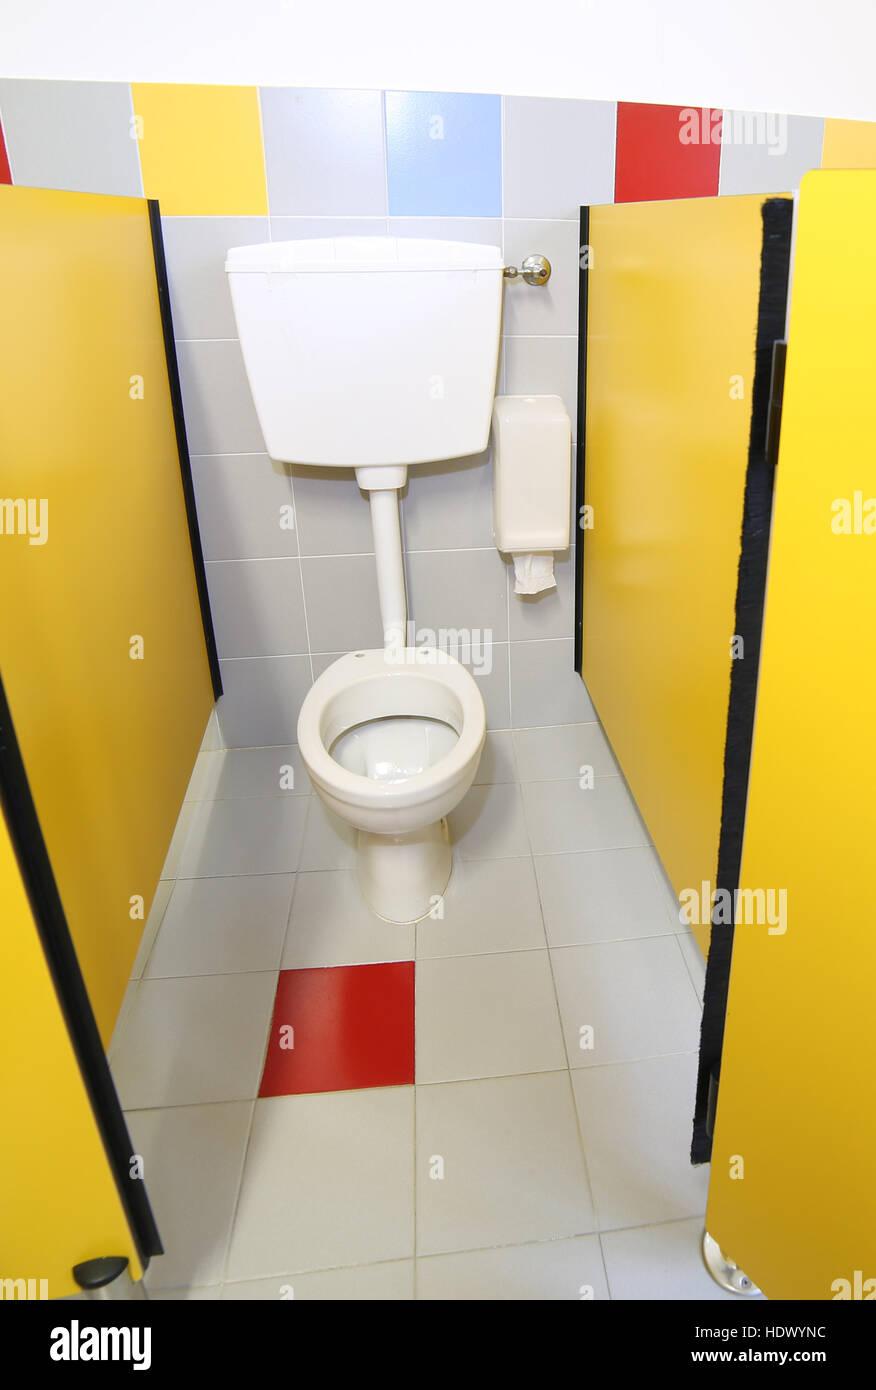 Small Toilet In Bathroom Kindergarten Stockfotos Small Toilet In